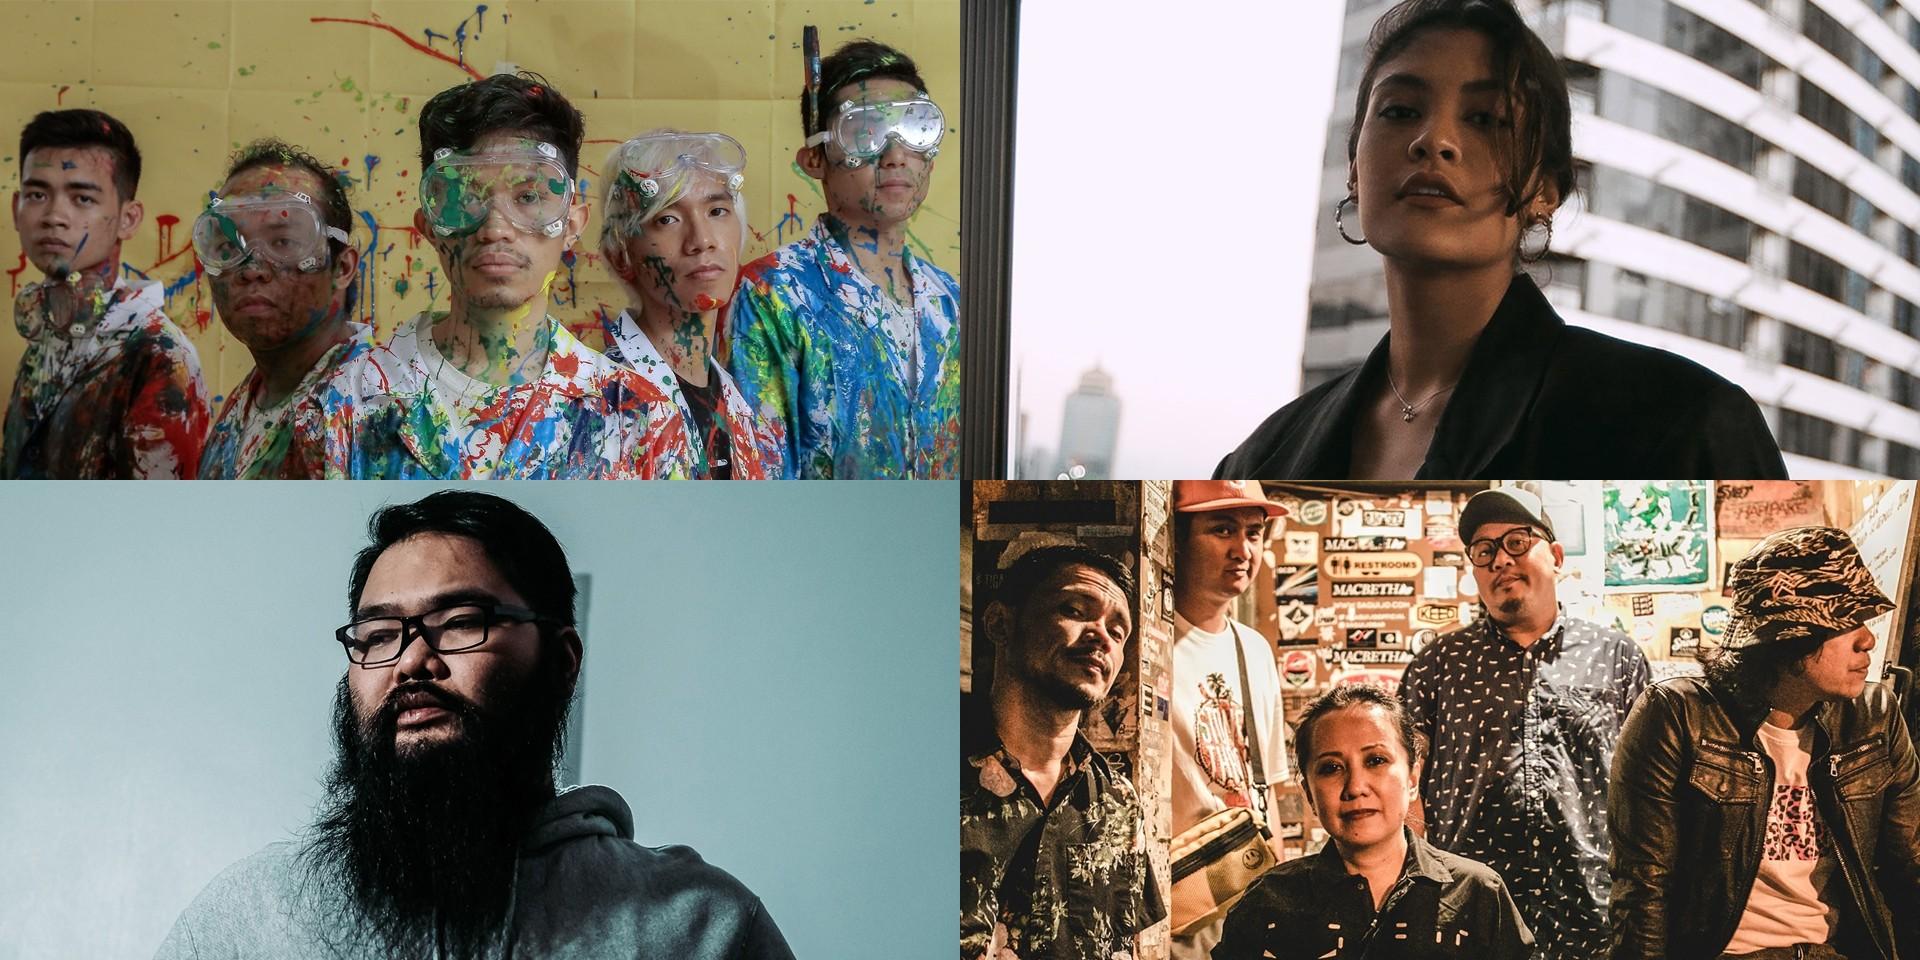 Munimuni, Sandwich, I Belong to the Zoo, Kiana Valenciano, and more release new music – listen